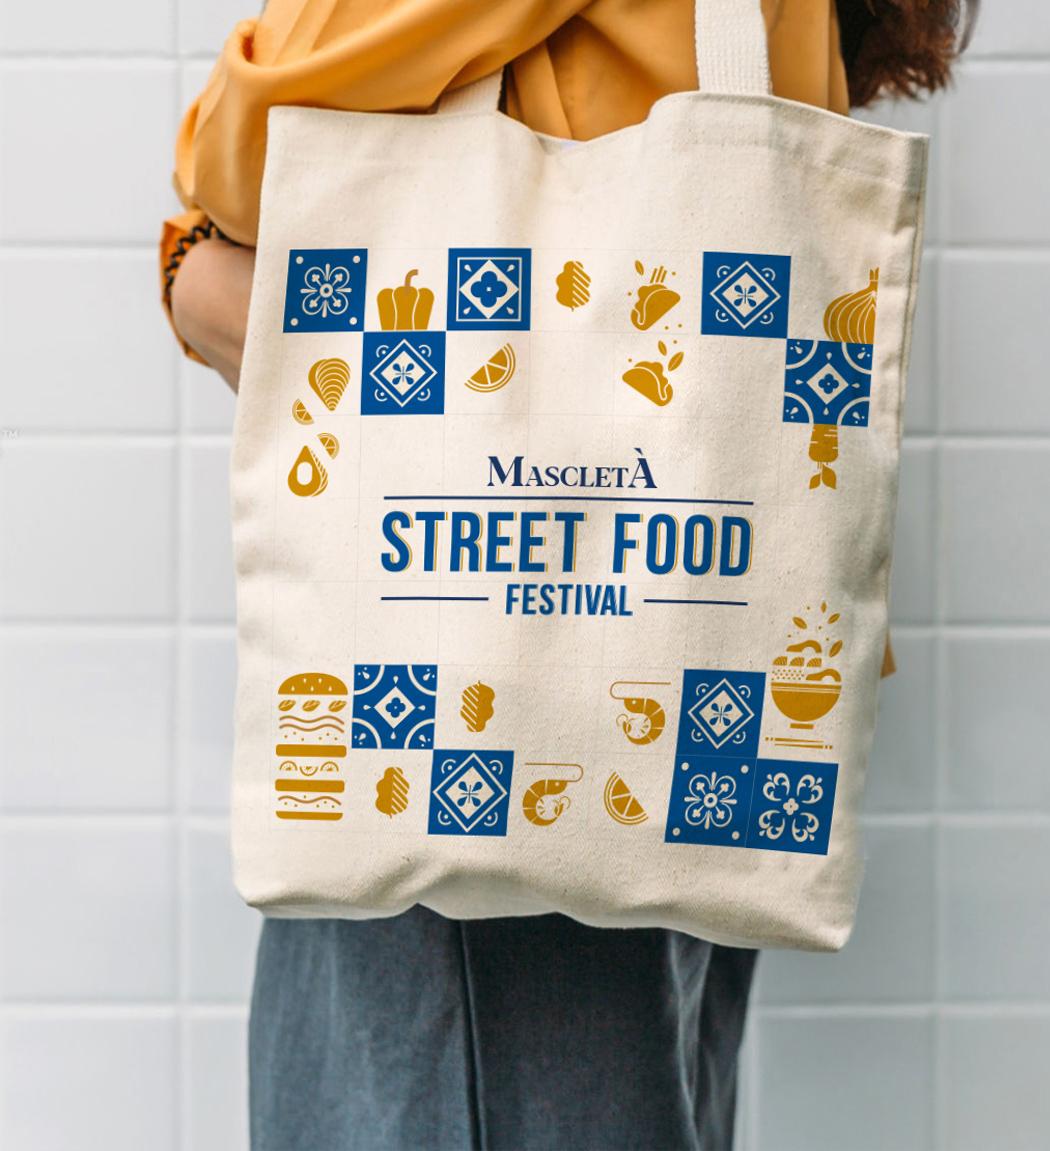 Mascletà Street Food Festival diseño Identidad Visual por Gelpi Design